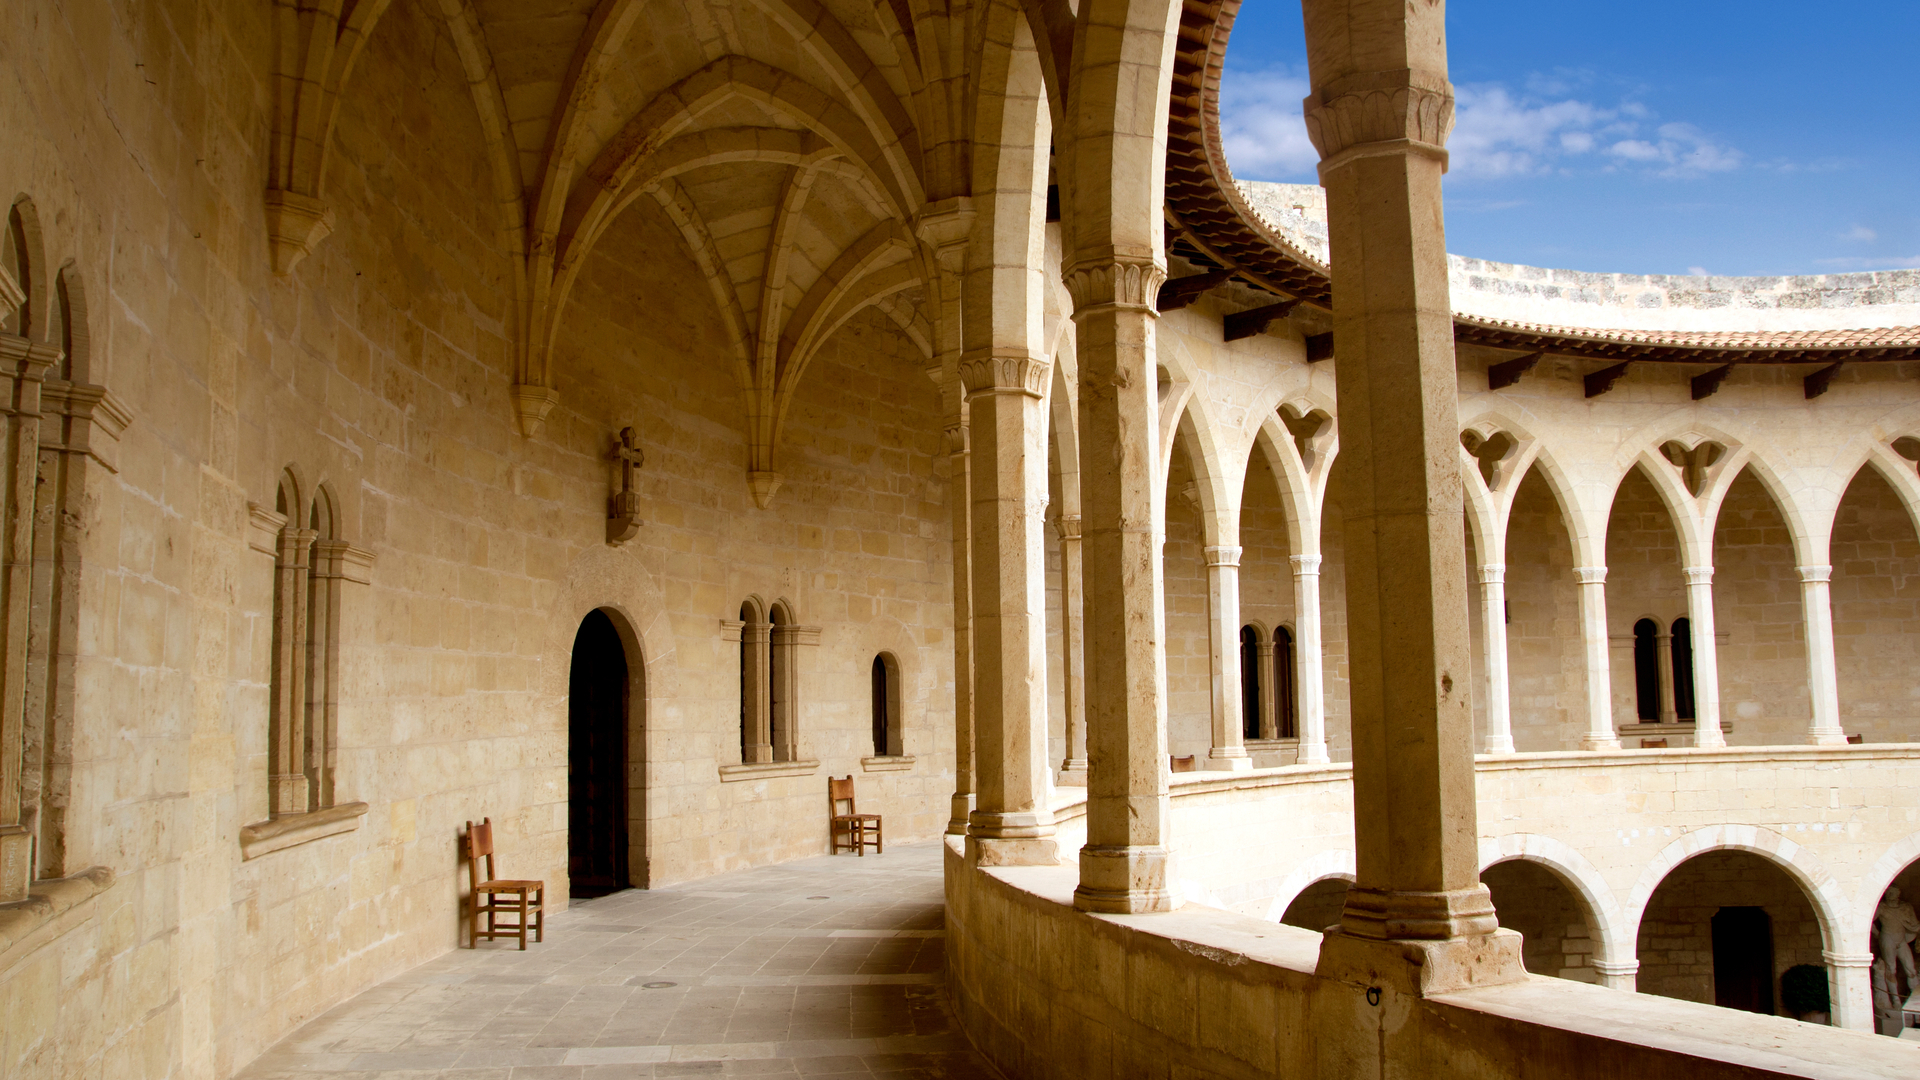 Bellver castle inside